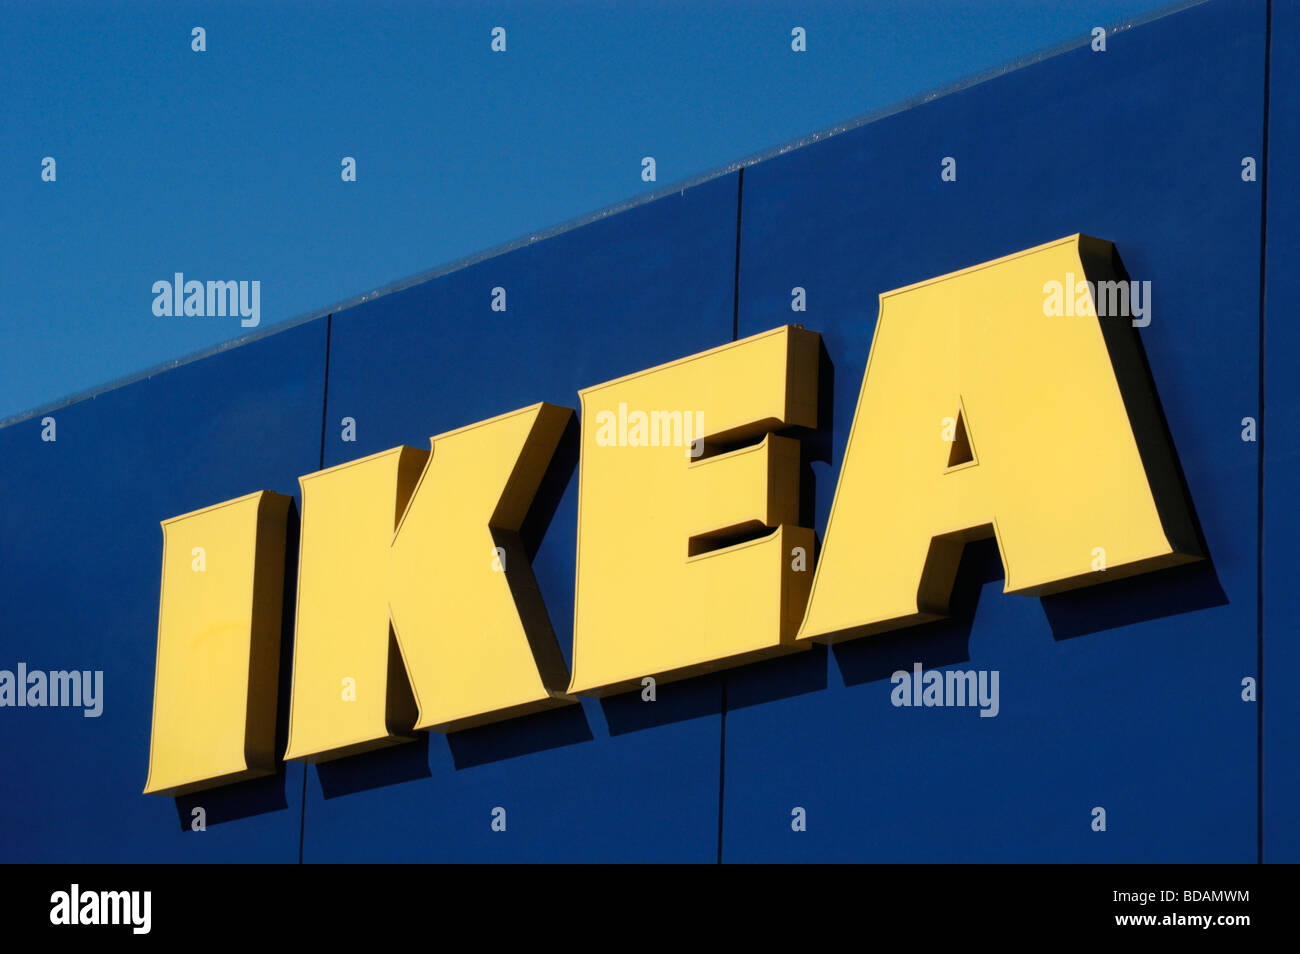 Analogous colors stock photos analogous colors stock for Ikea in orange county